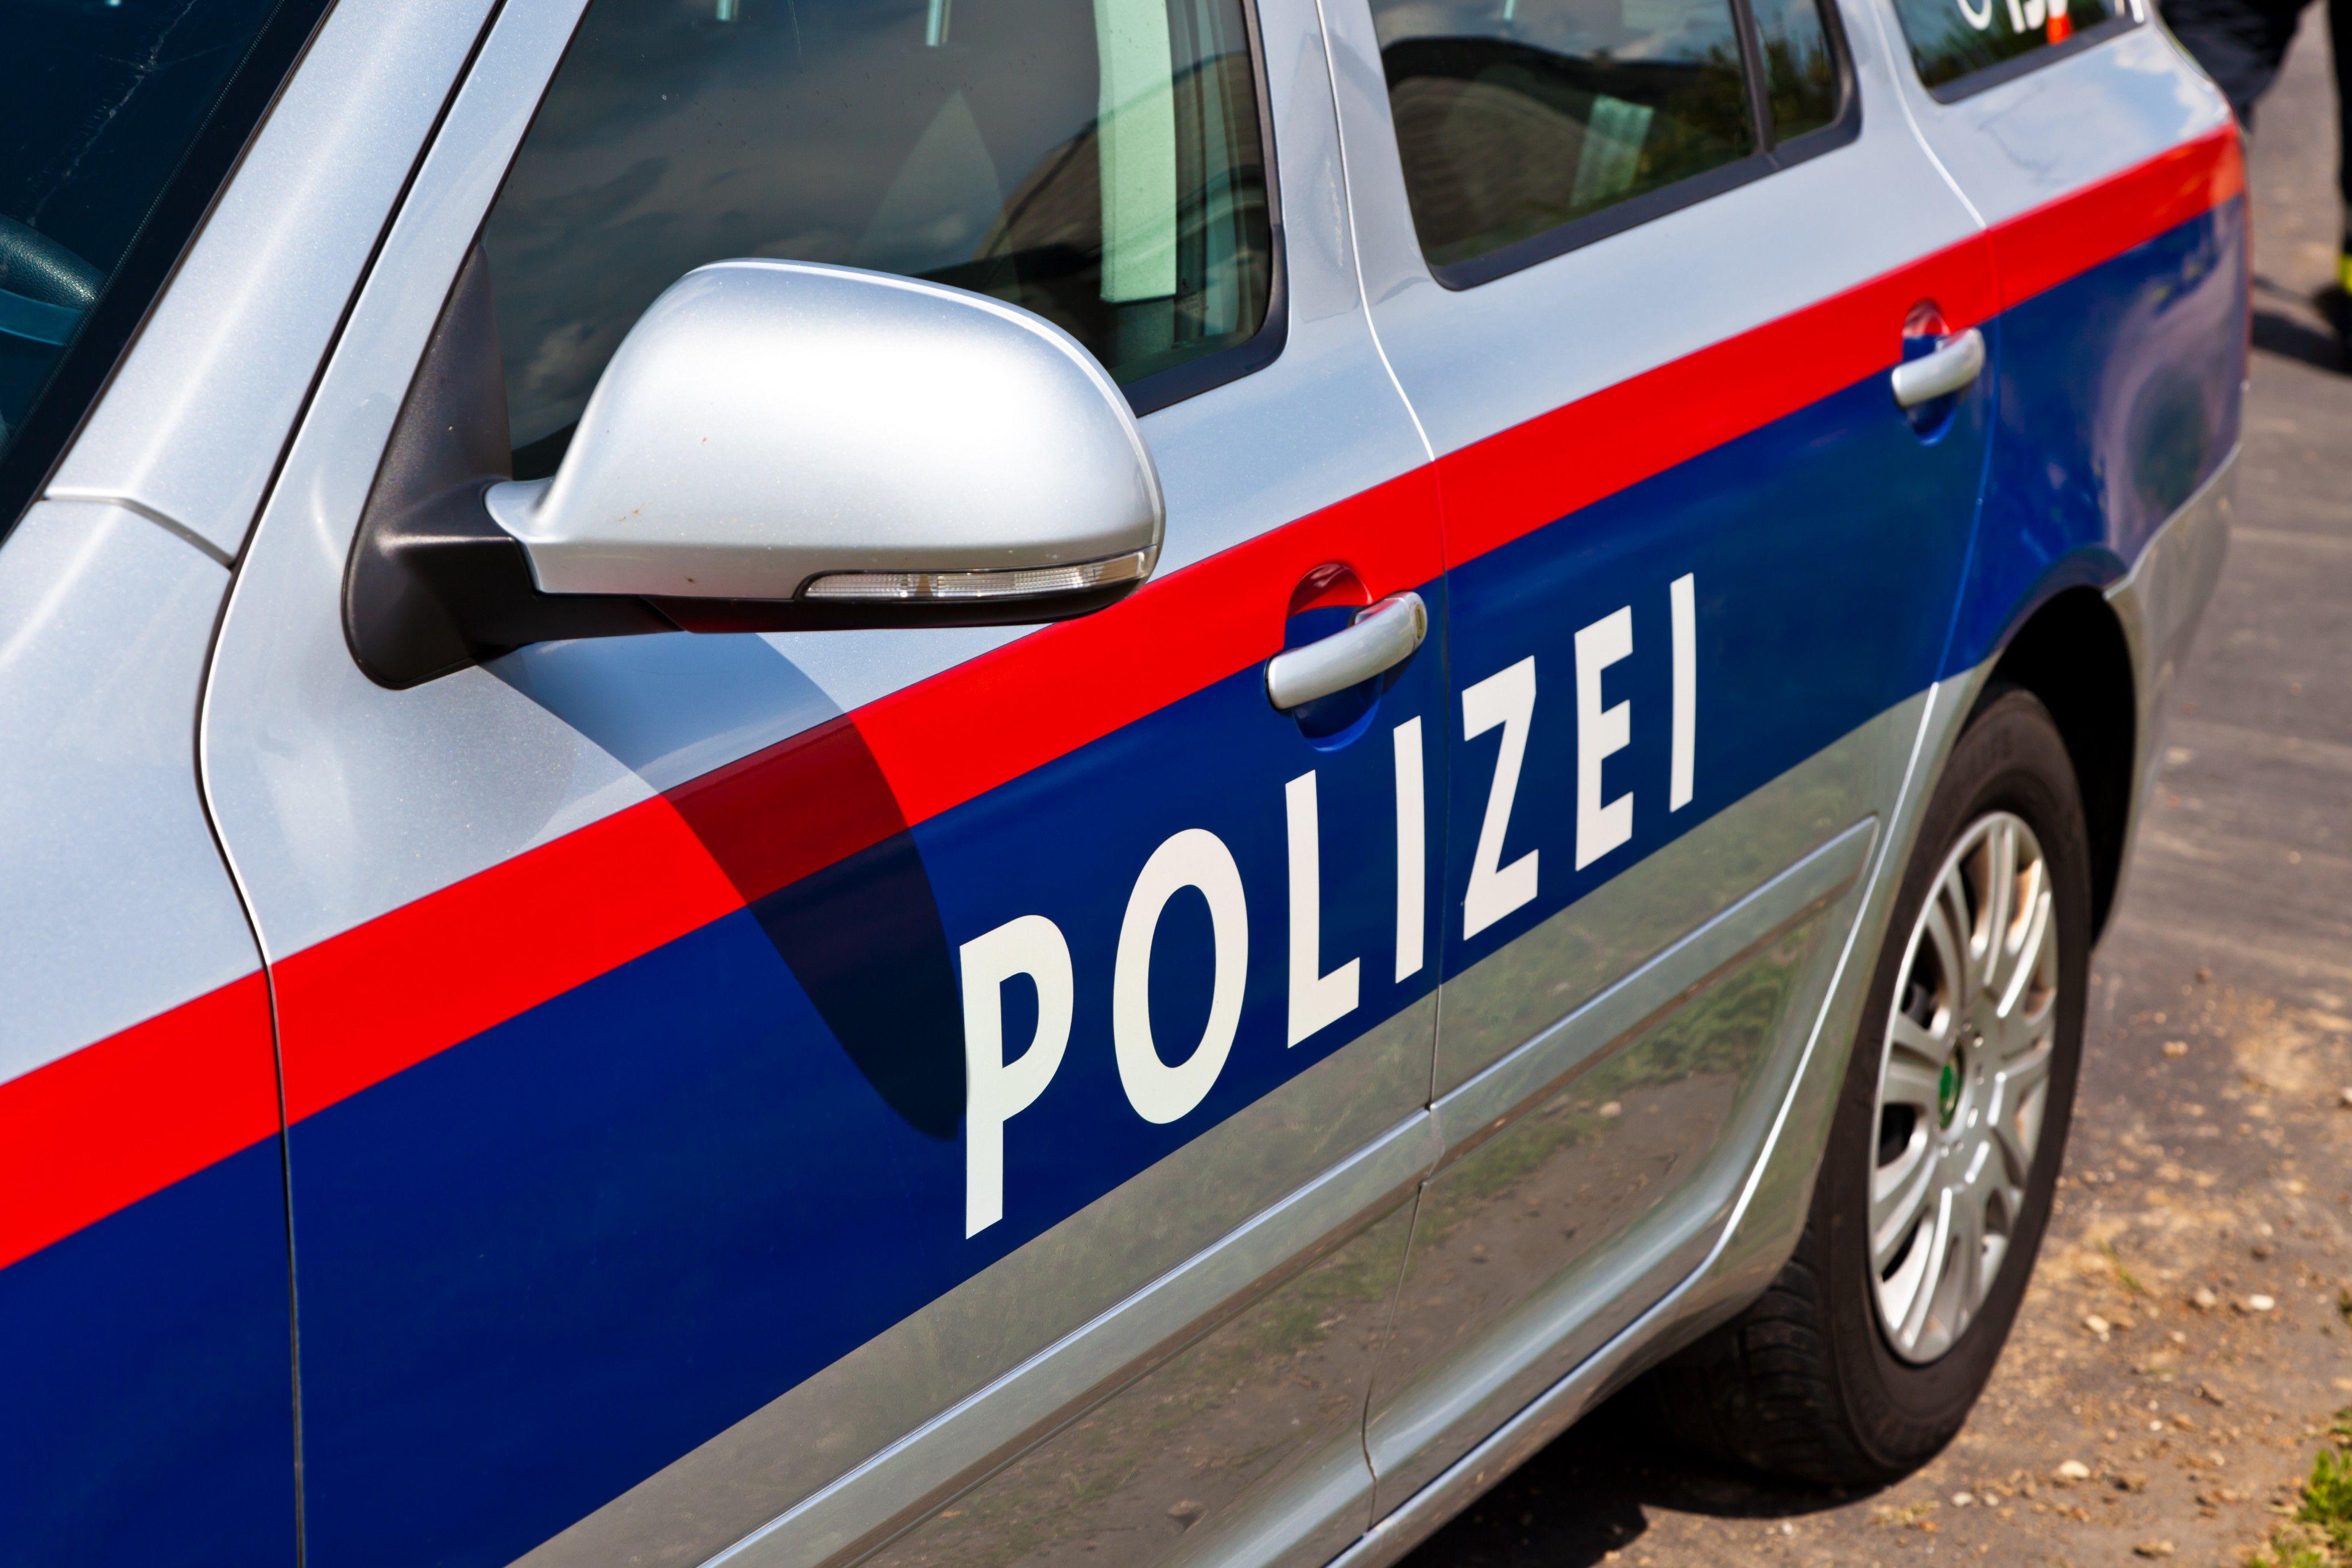 Vorarlberg - Pkw kracht gegen Moped: Zwei 15-Jährige verletzt